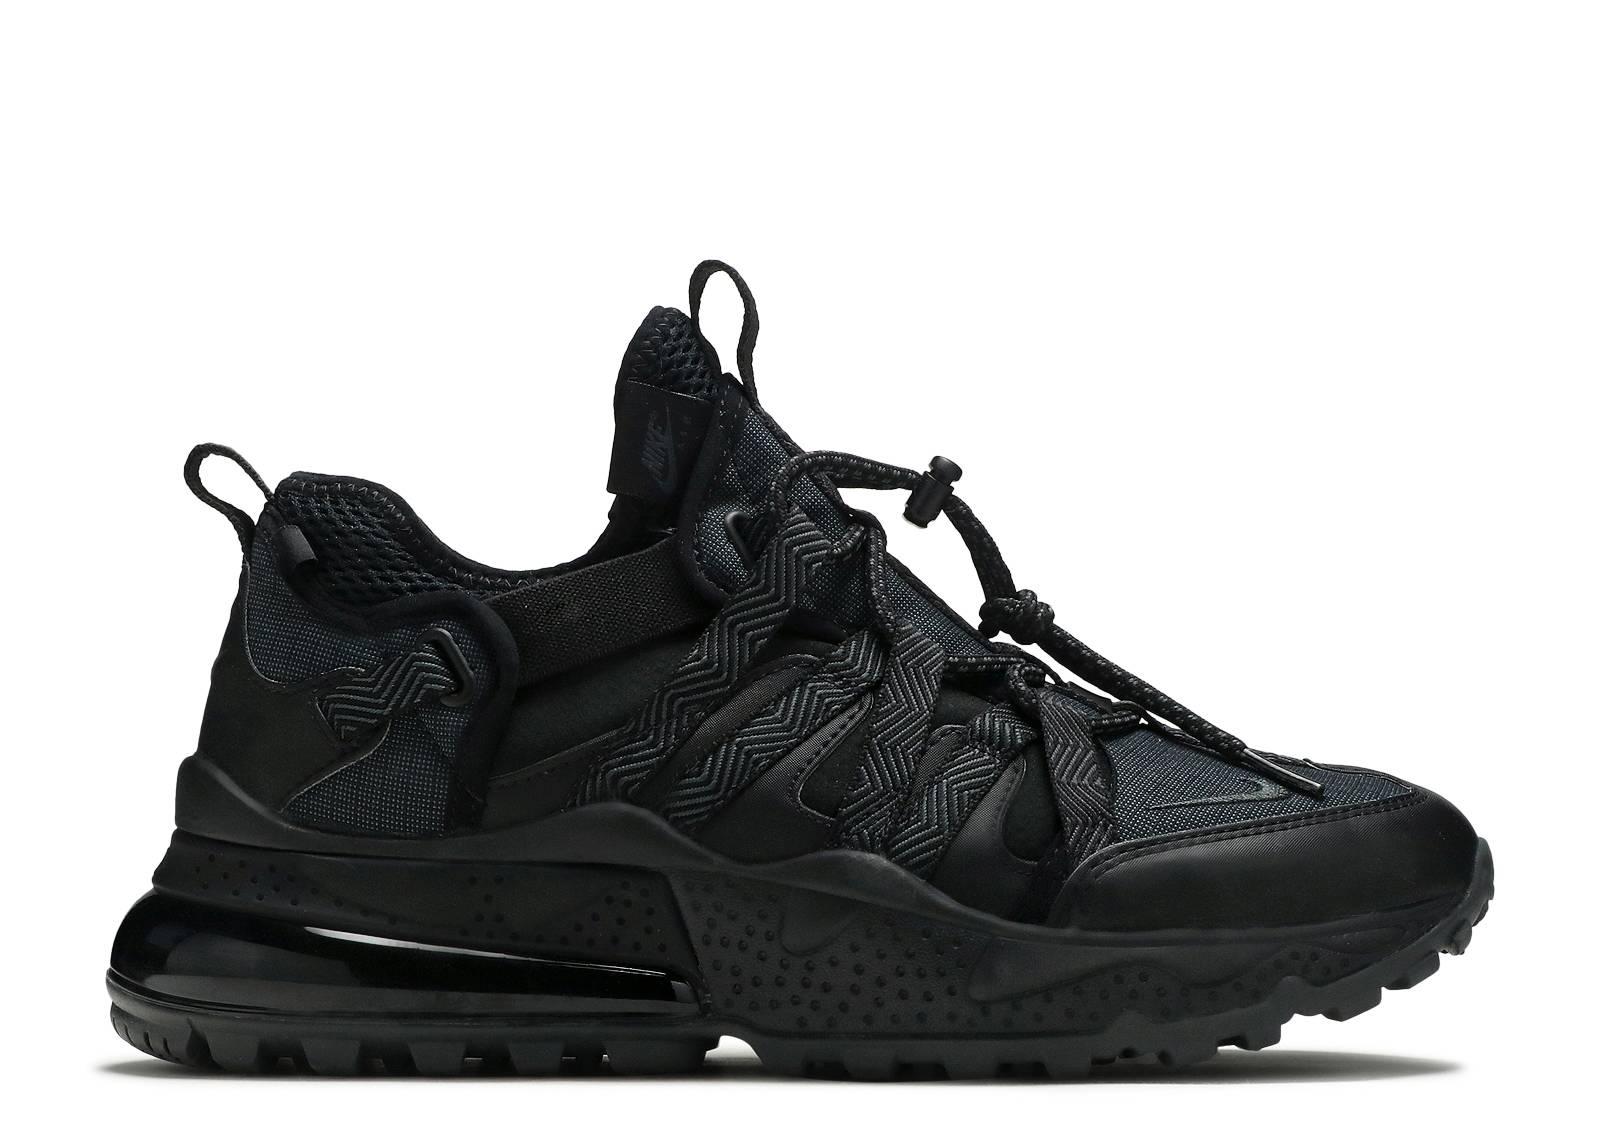 the best attitude 48c4a 2d5d8 Nike Air Max 270 - Men's & Women's Shoes | Flight Club